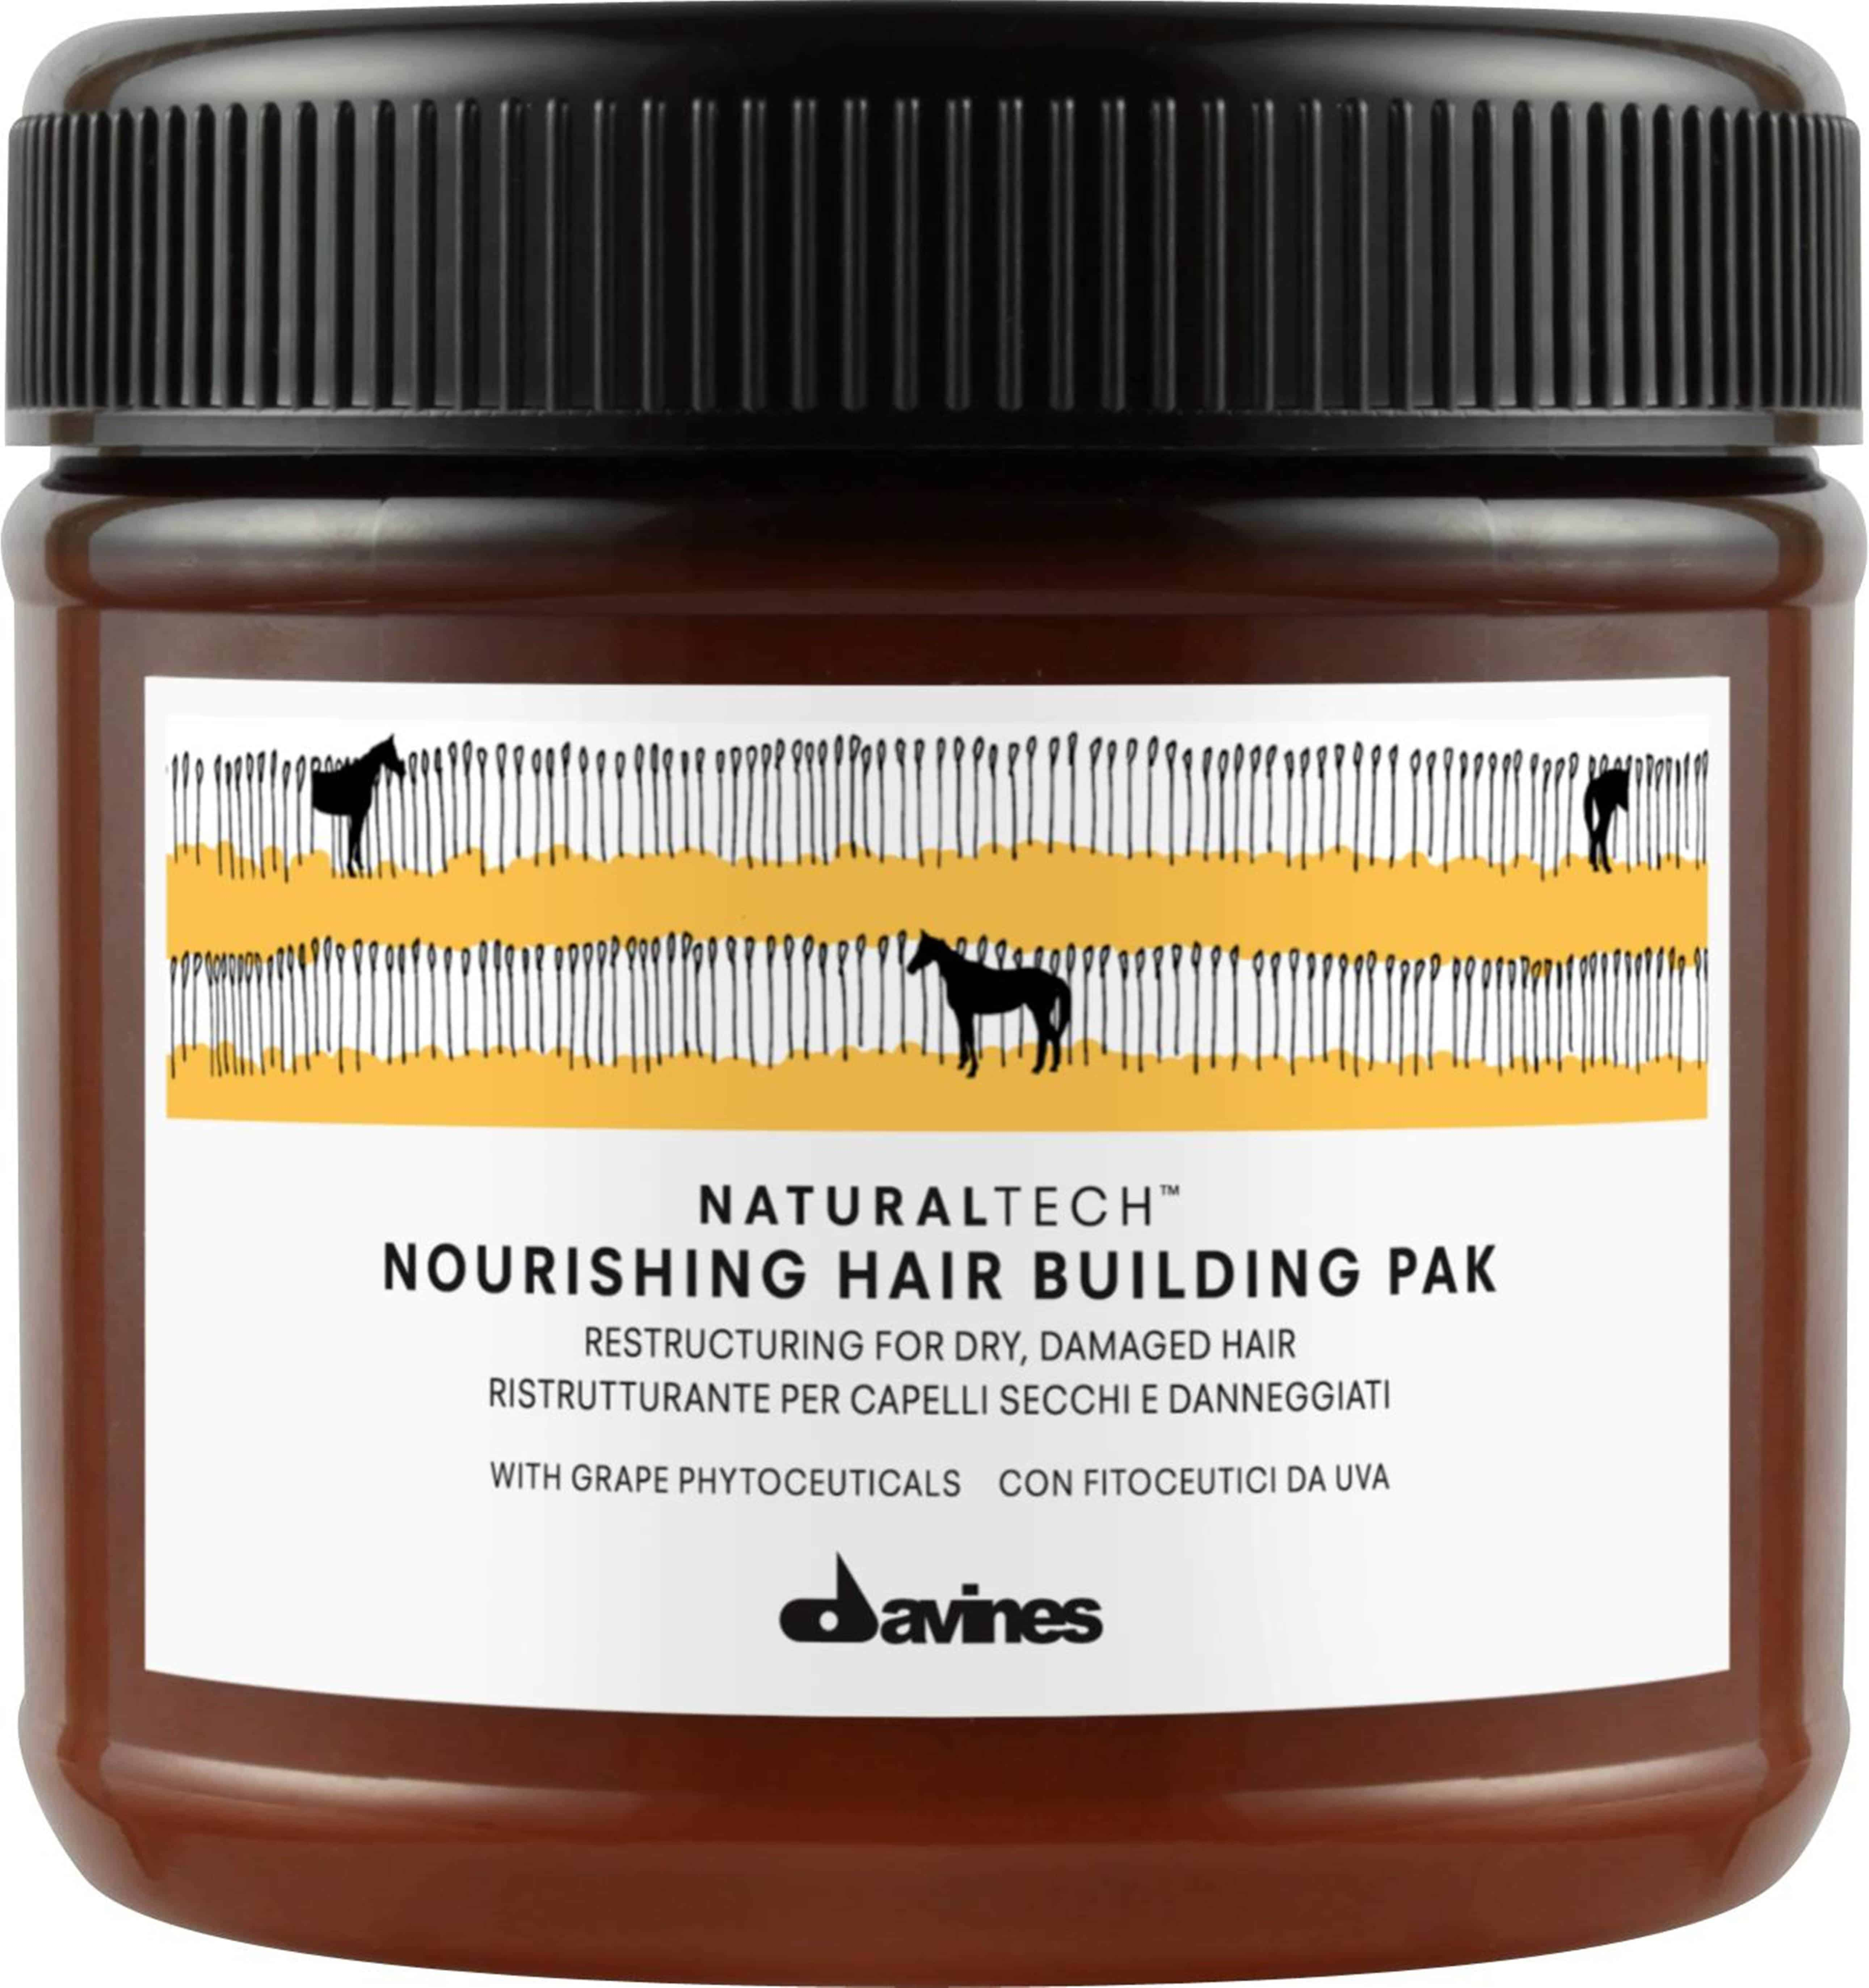 Natural Tech Nourishing Hair Building Pak Review